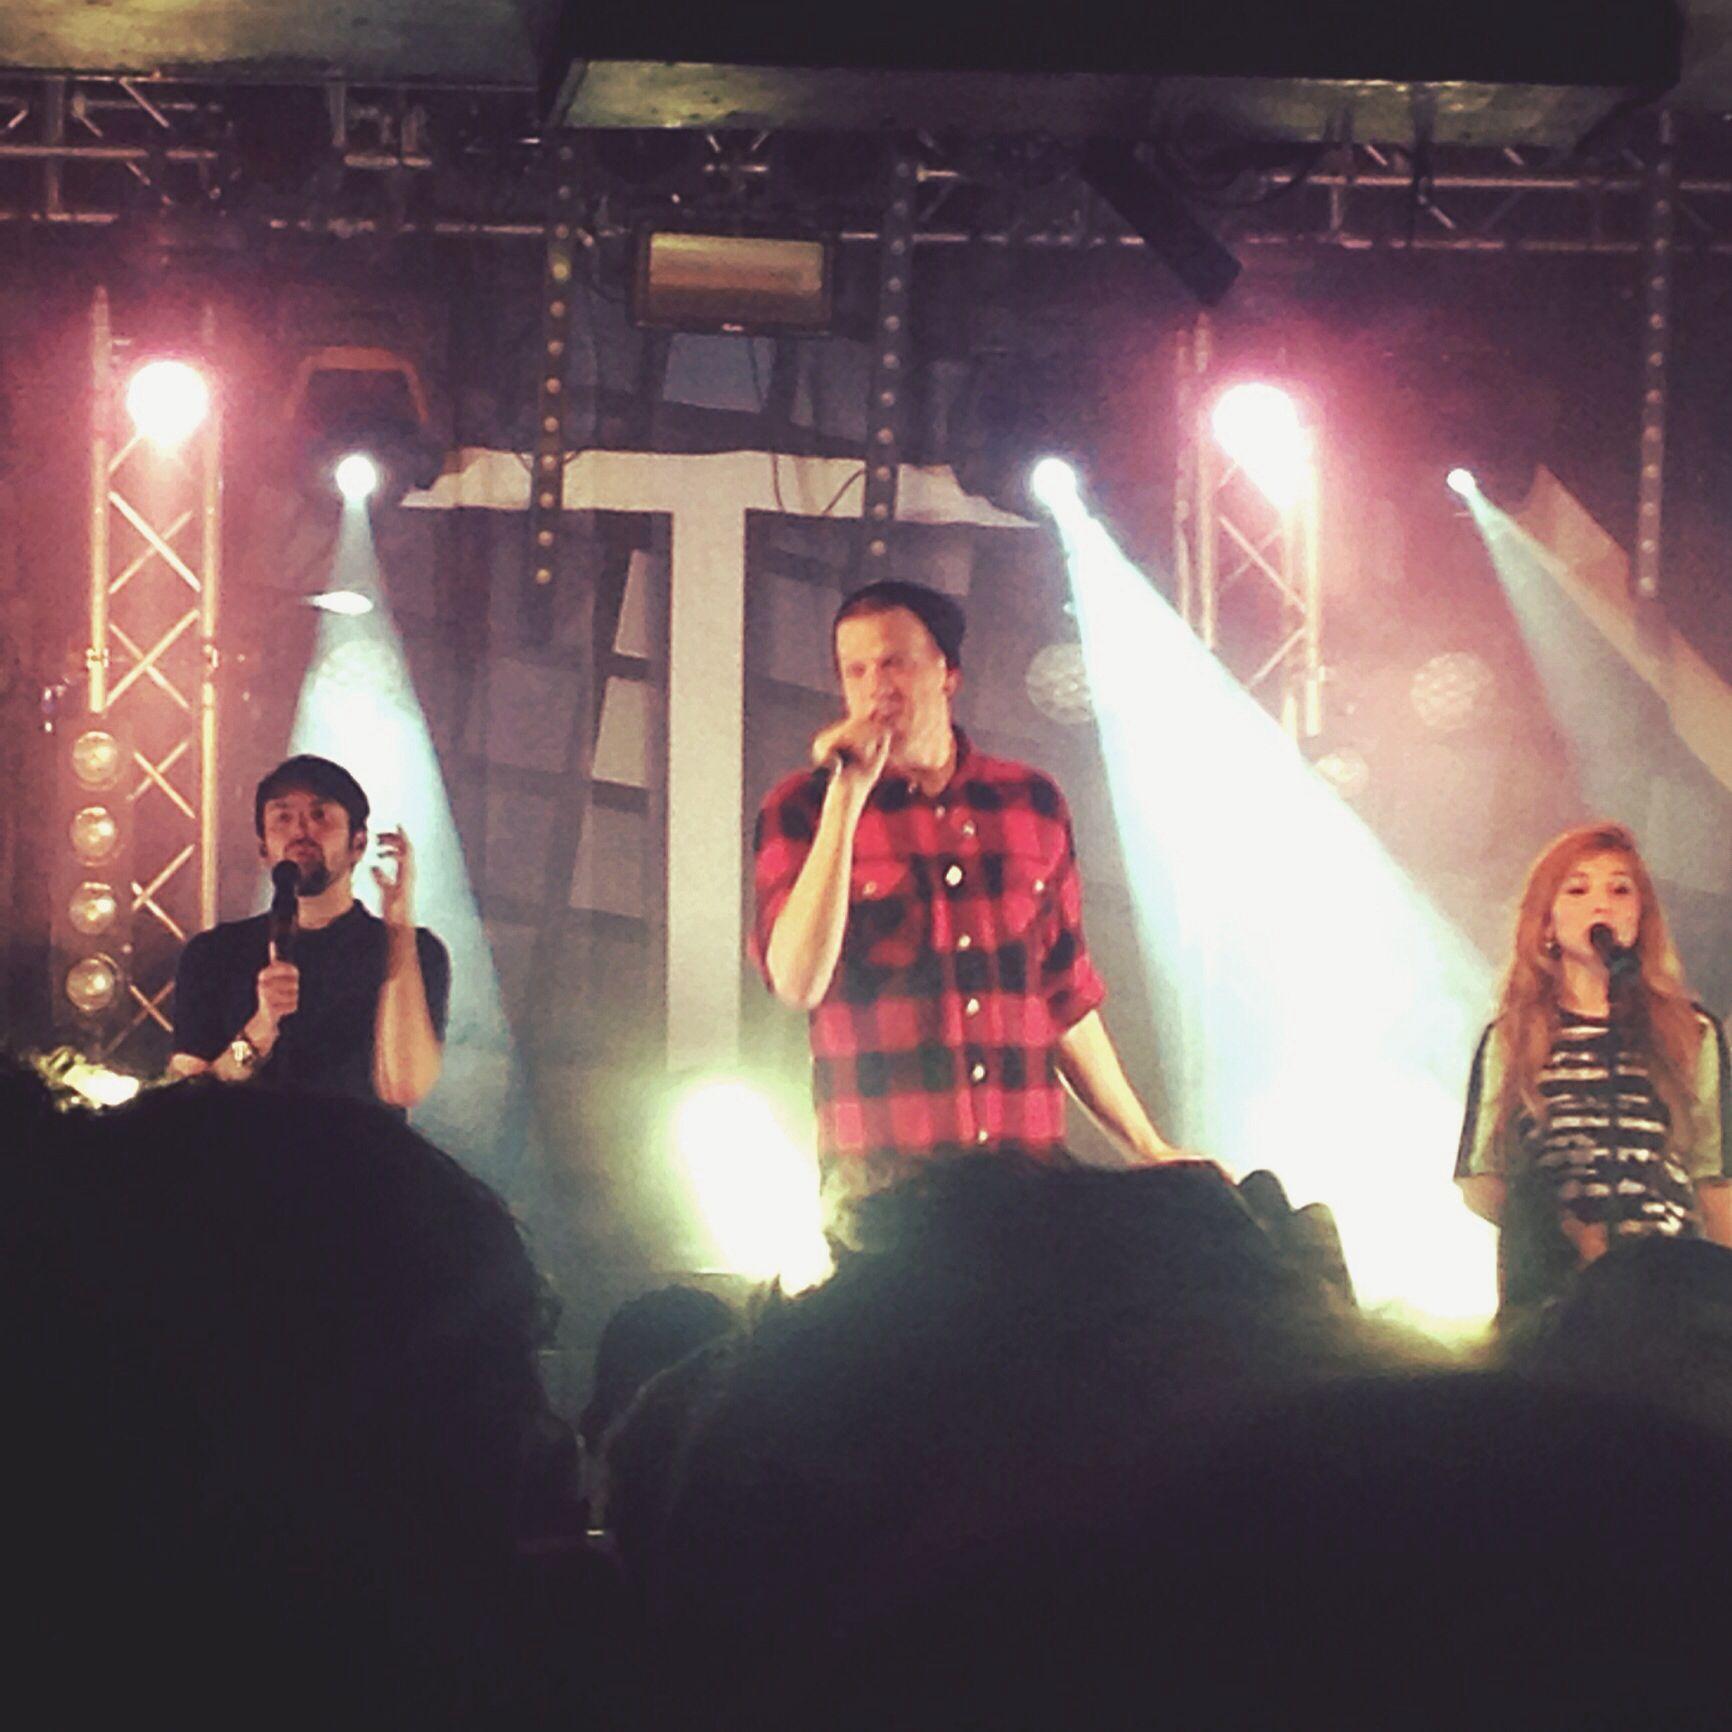 Ptx concert